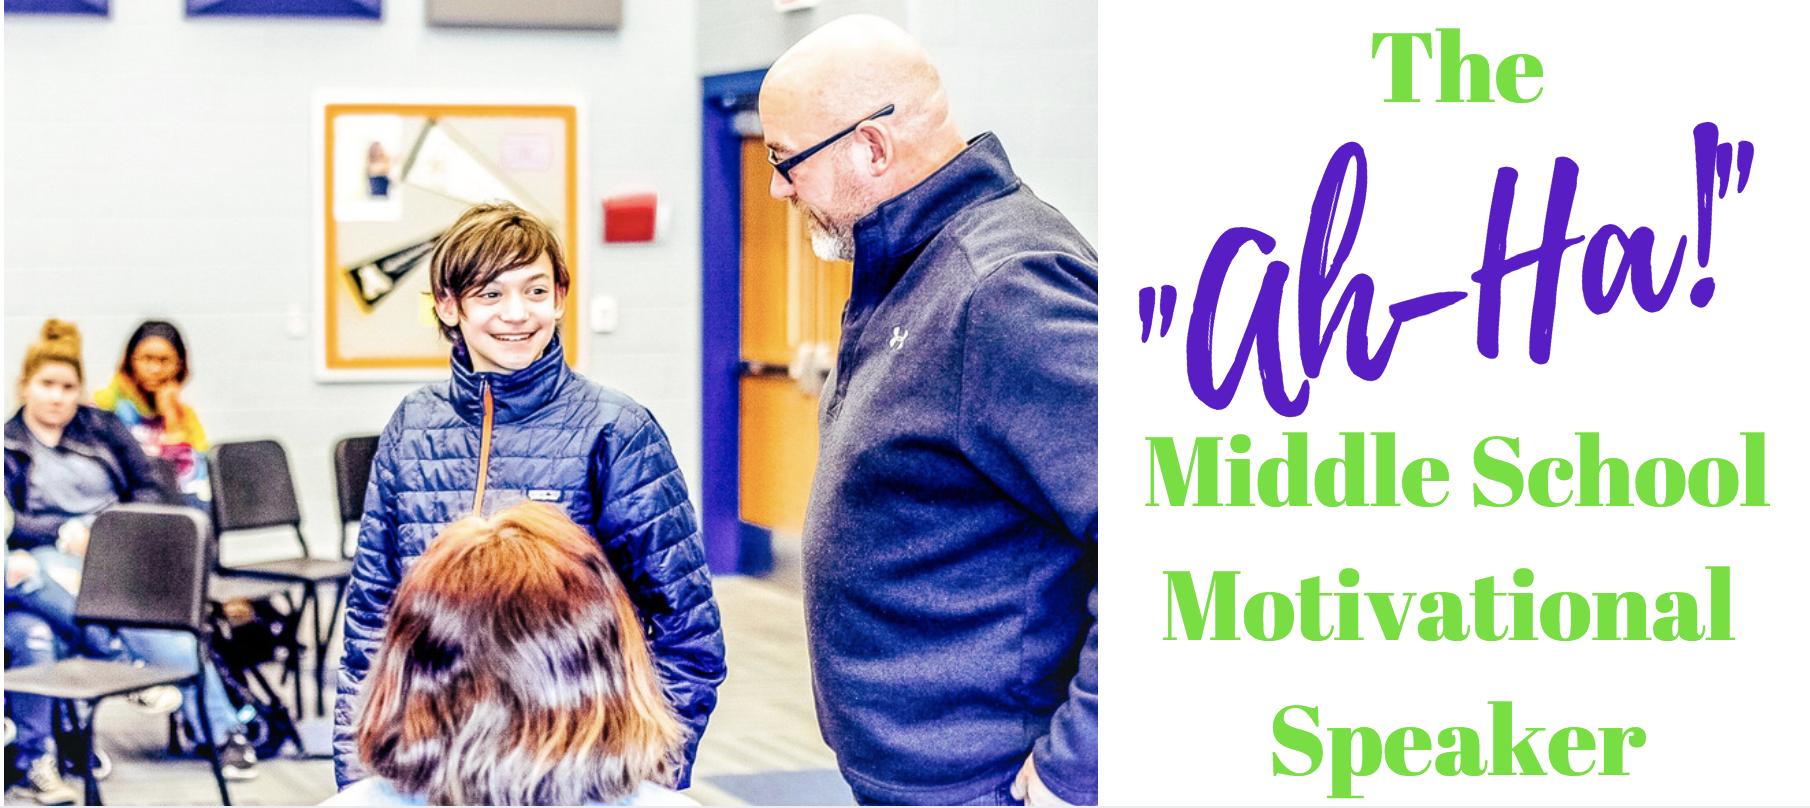 Middle School Motivational Speaker